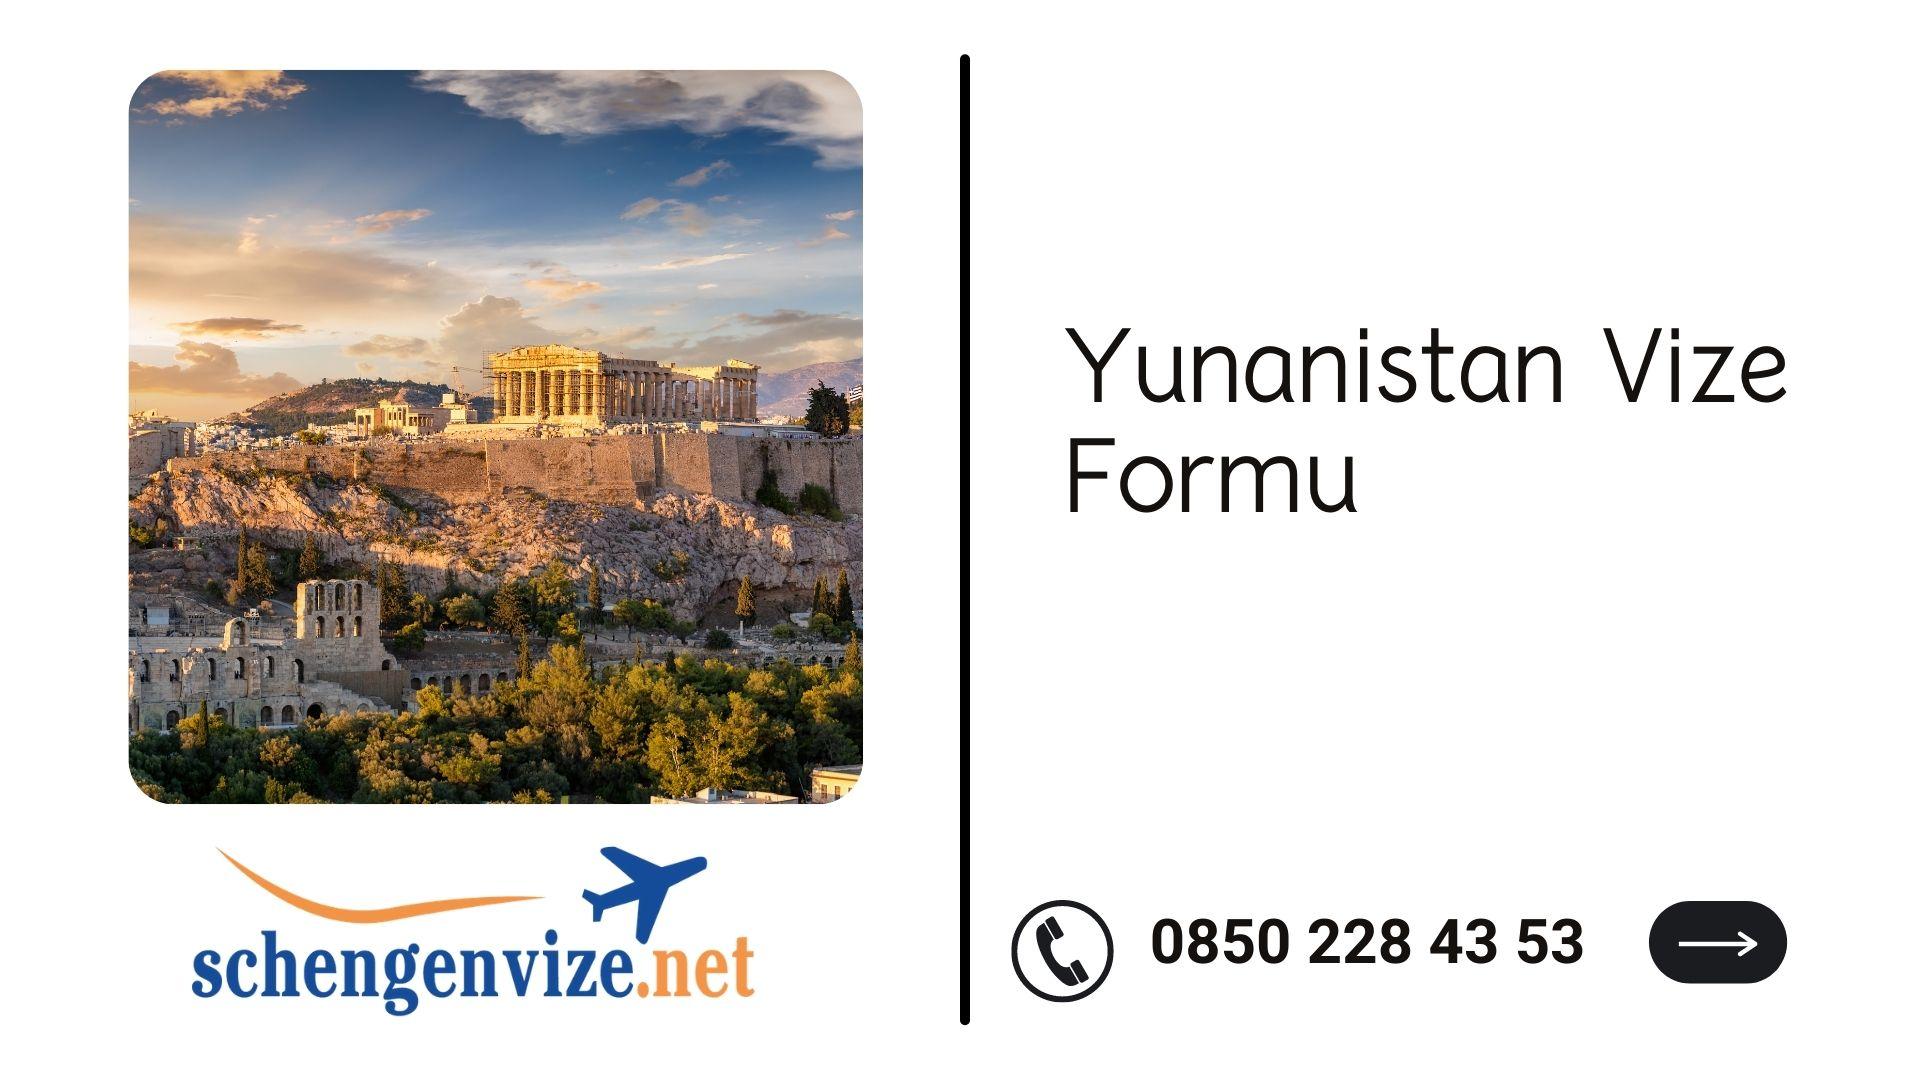 Yunanistan Vize Formu